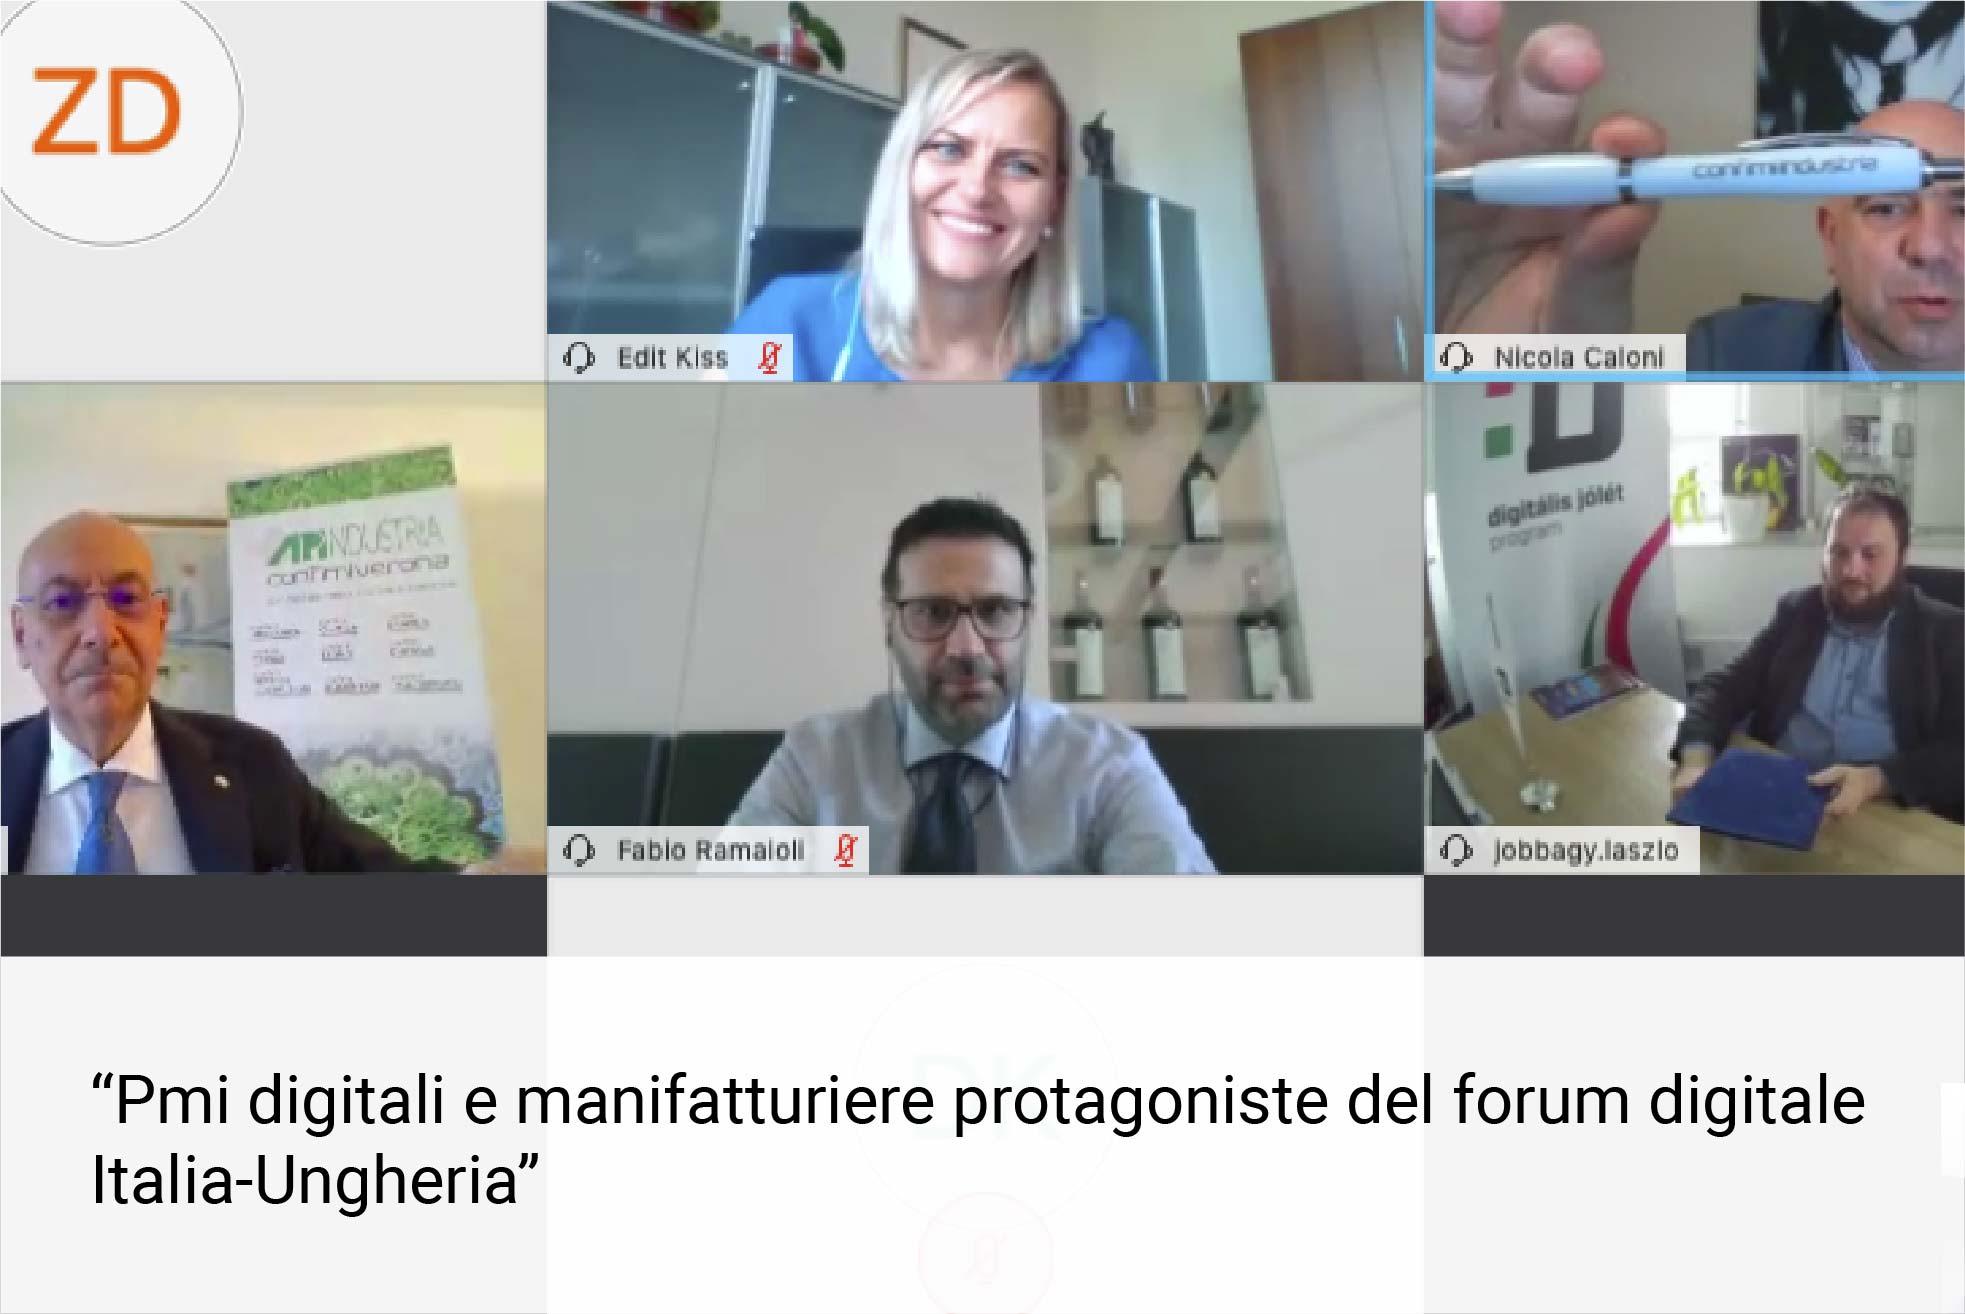 pmi-digitali-manufatturiere-protagoniste-forum-digitale-italia-ungheria